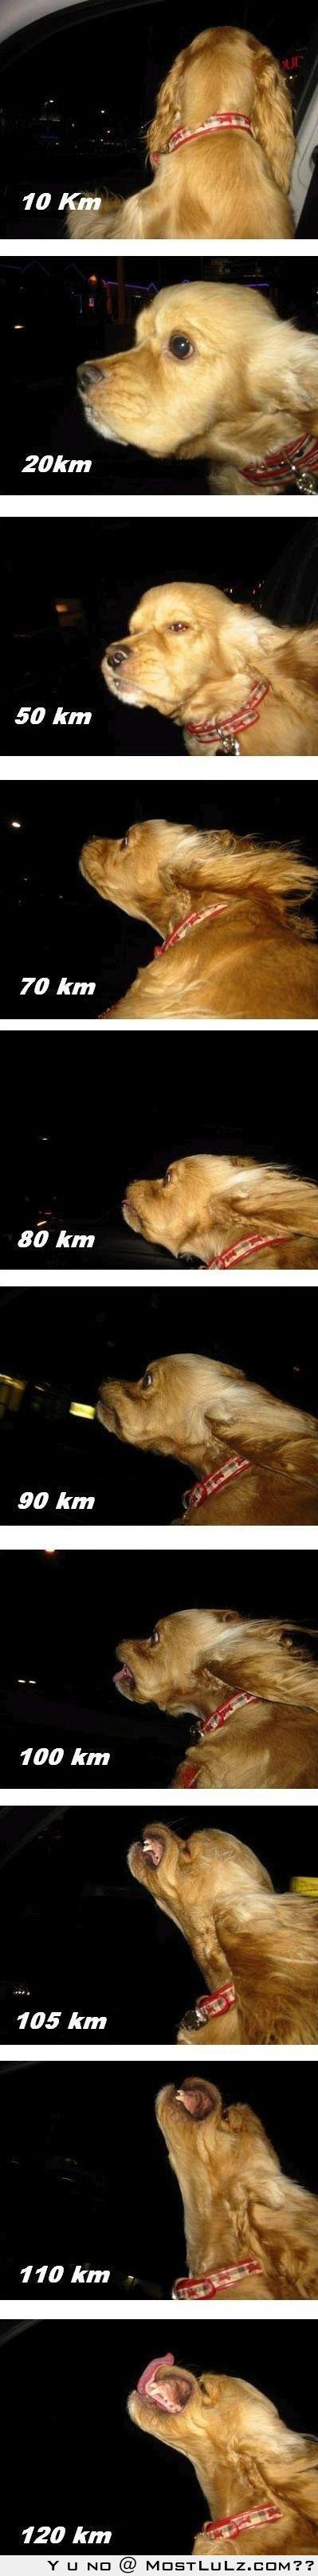 Dog Speedometer LuLz